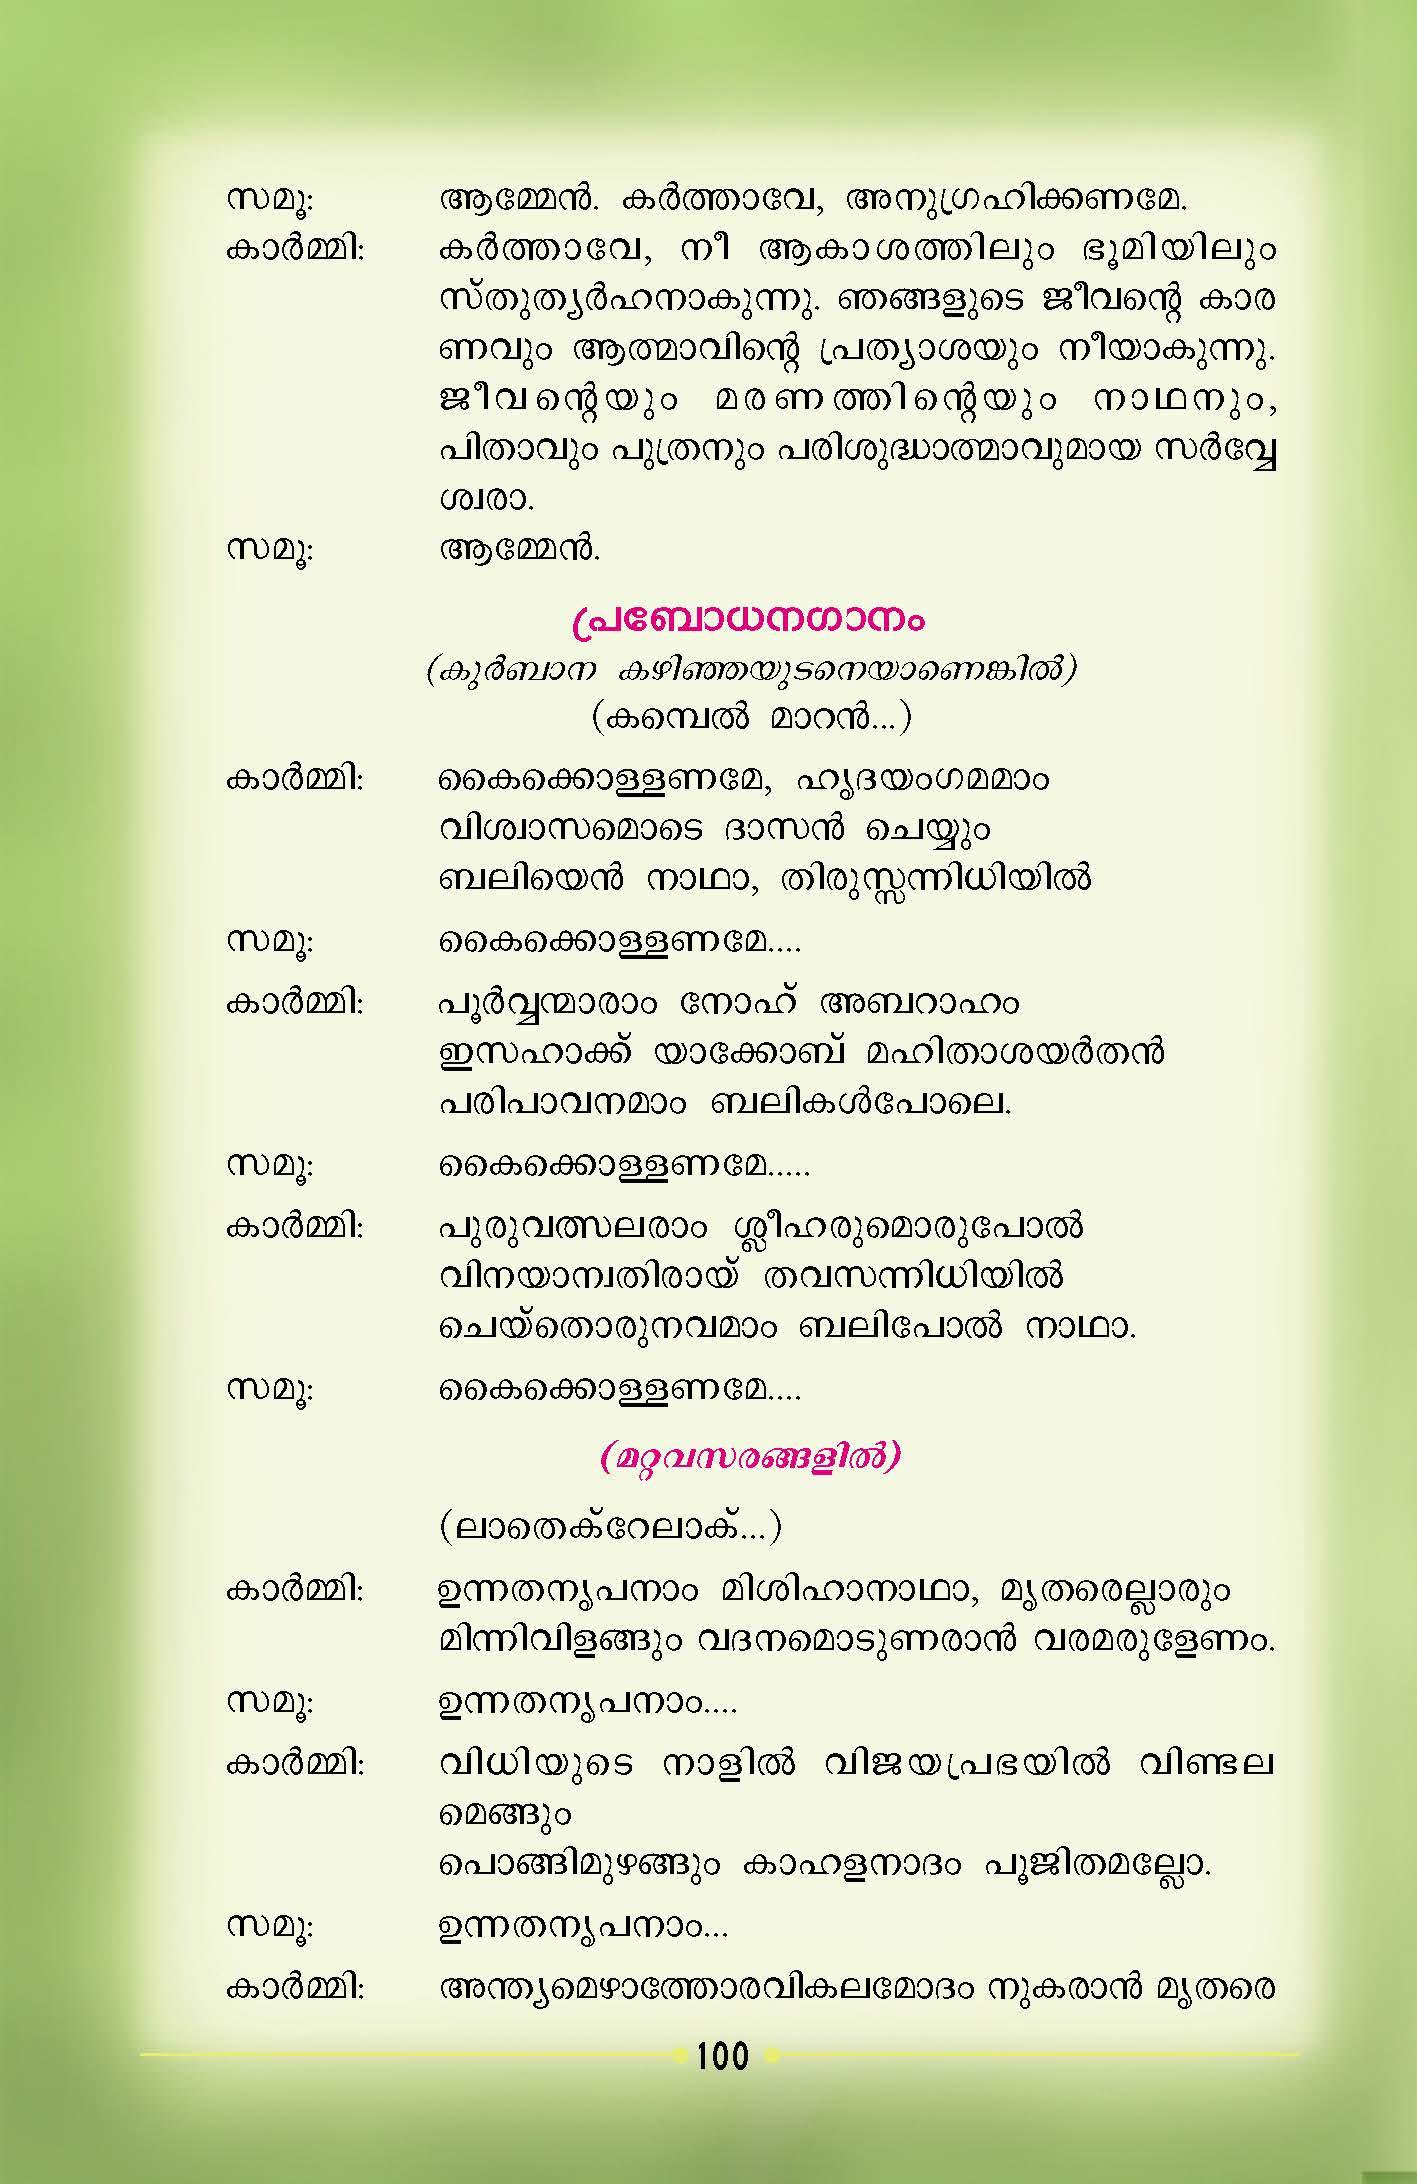 Cheriya Oppesu Office for the Dead (Malayalam) 03